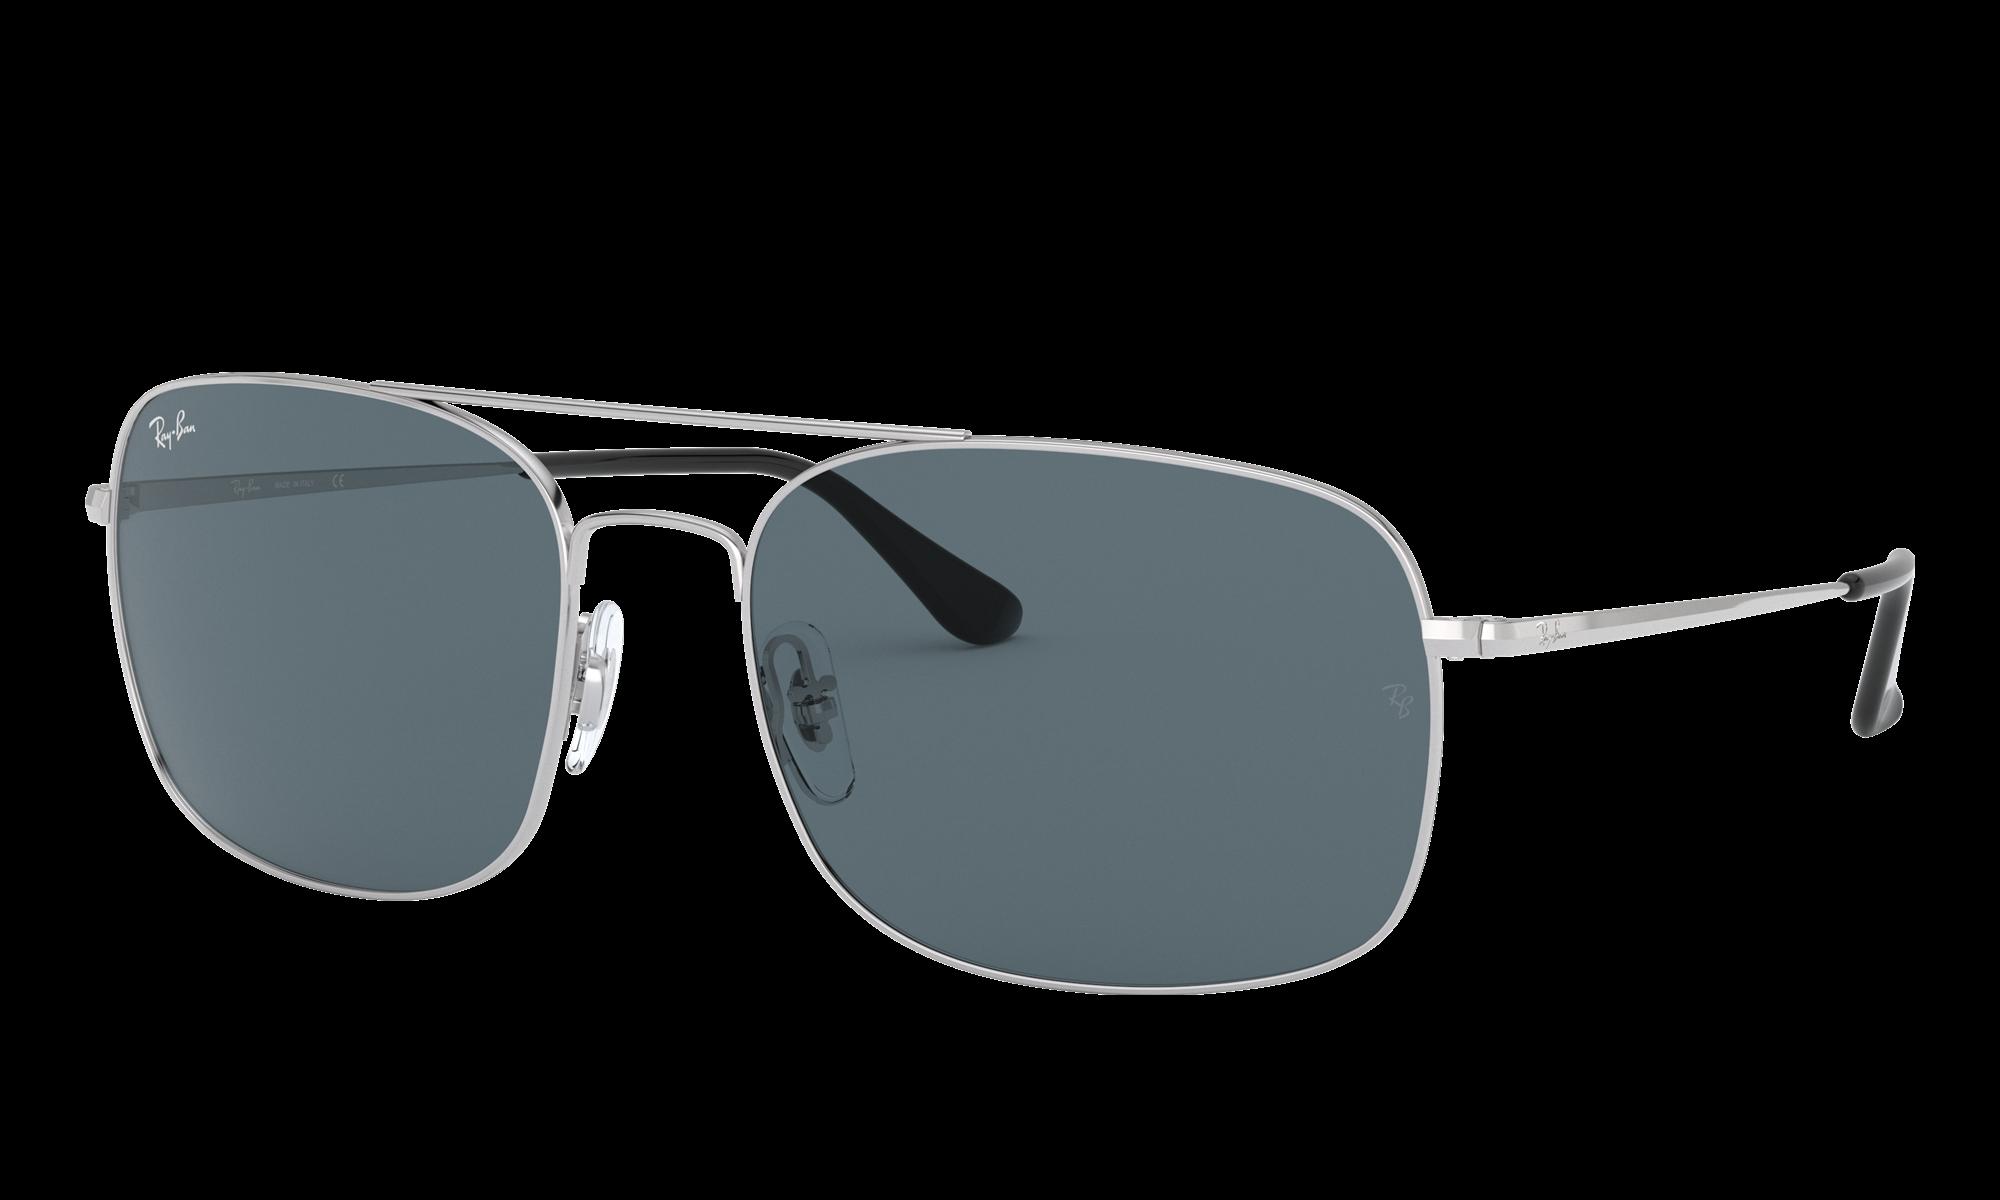 Ray-Ban RB3611 | Glasses.com® | Free Shipping